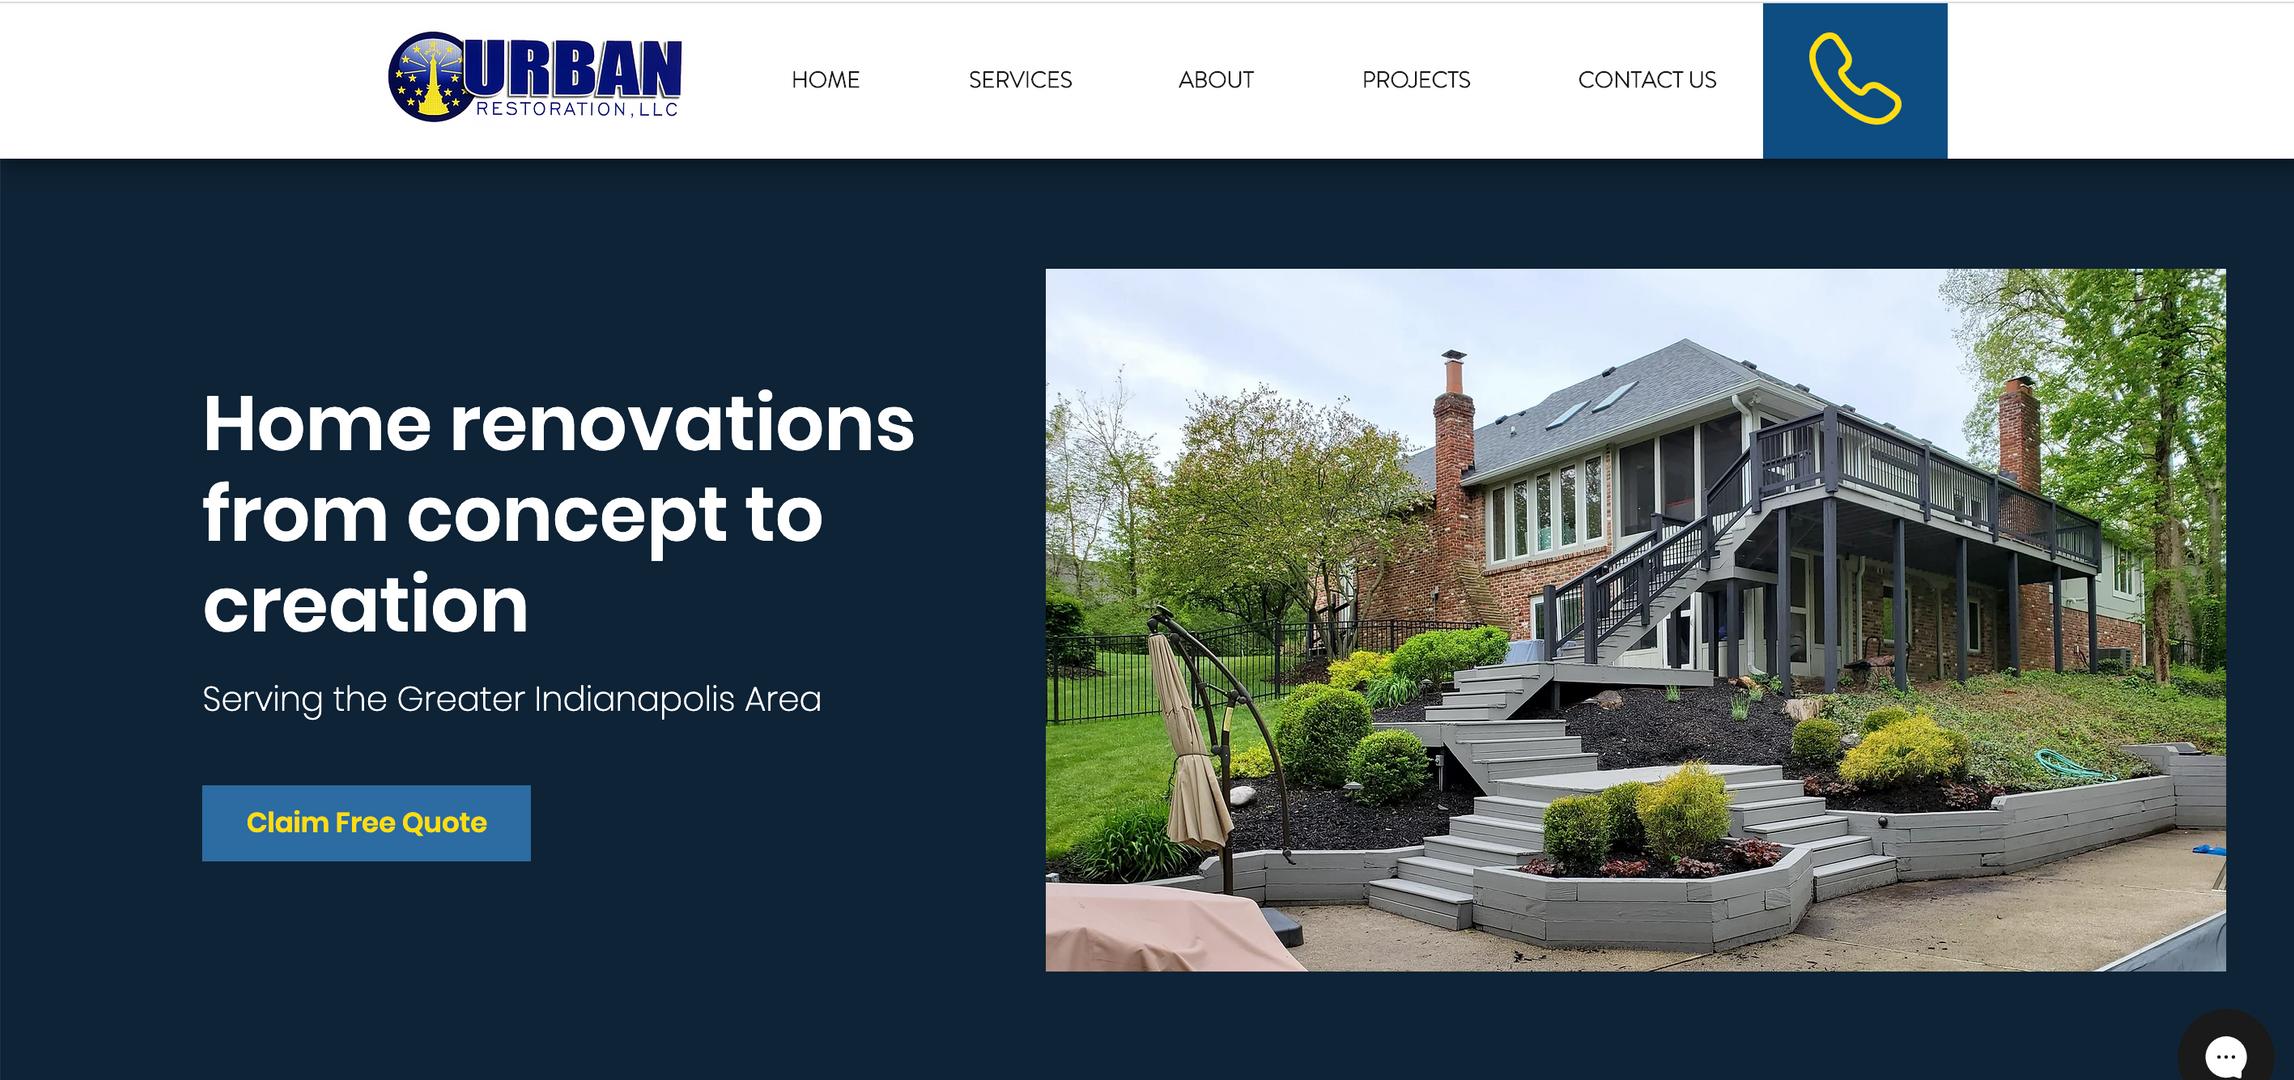 Urban Restoration LLC